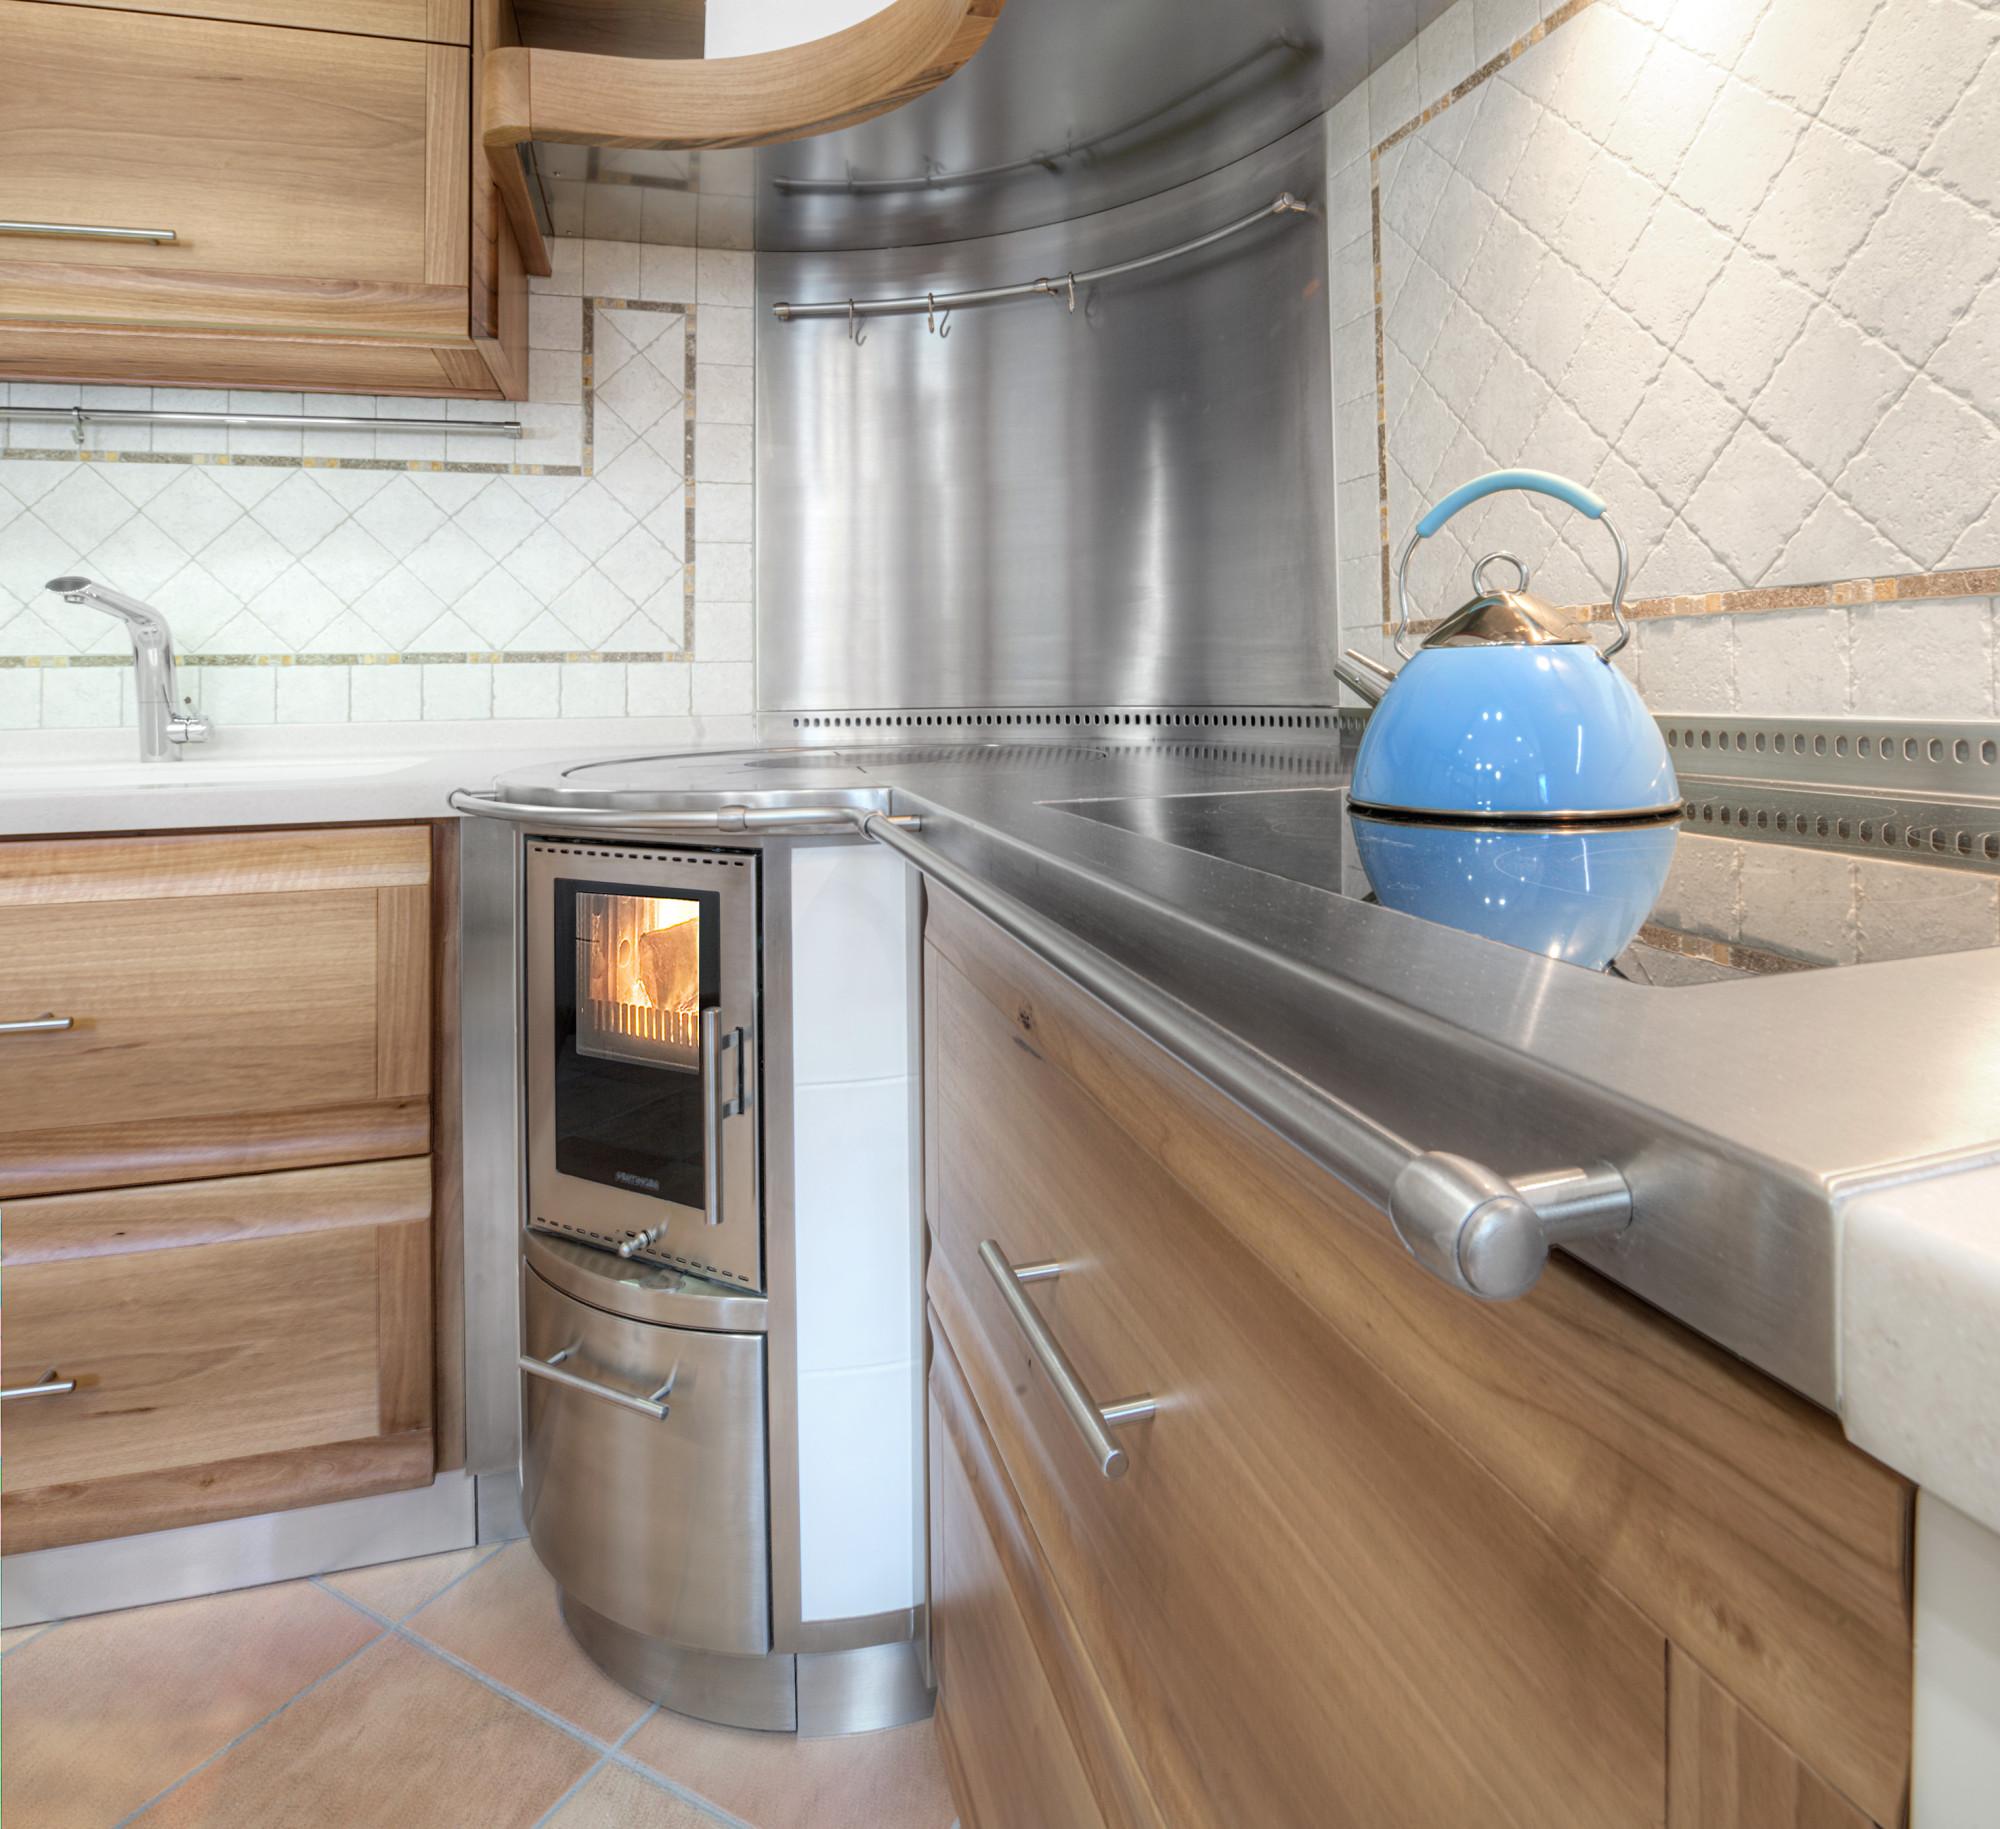 feuerkonstrukt k chenherd. Black Bedroom Furniture Sets. Home Design Ideas